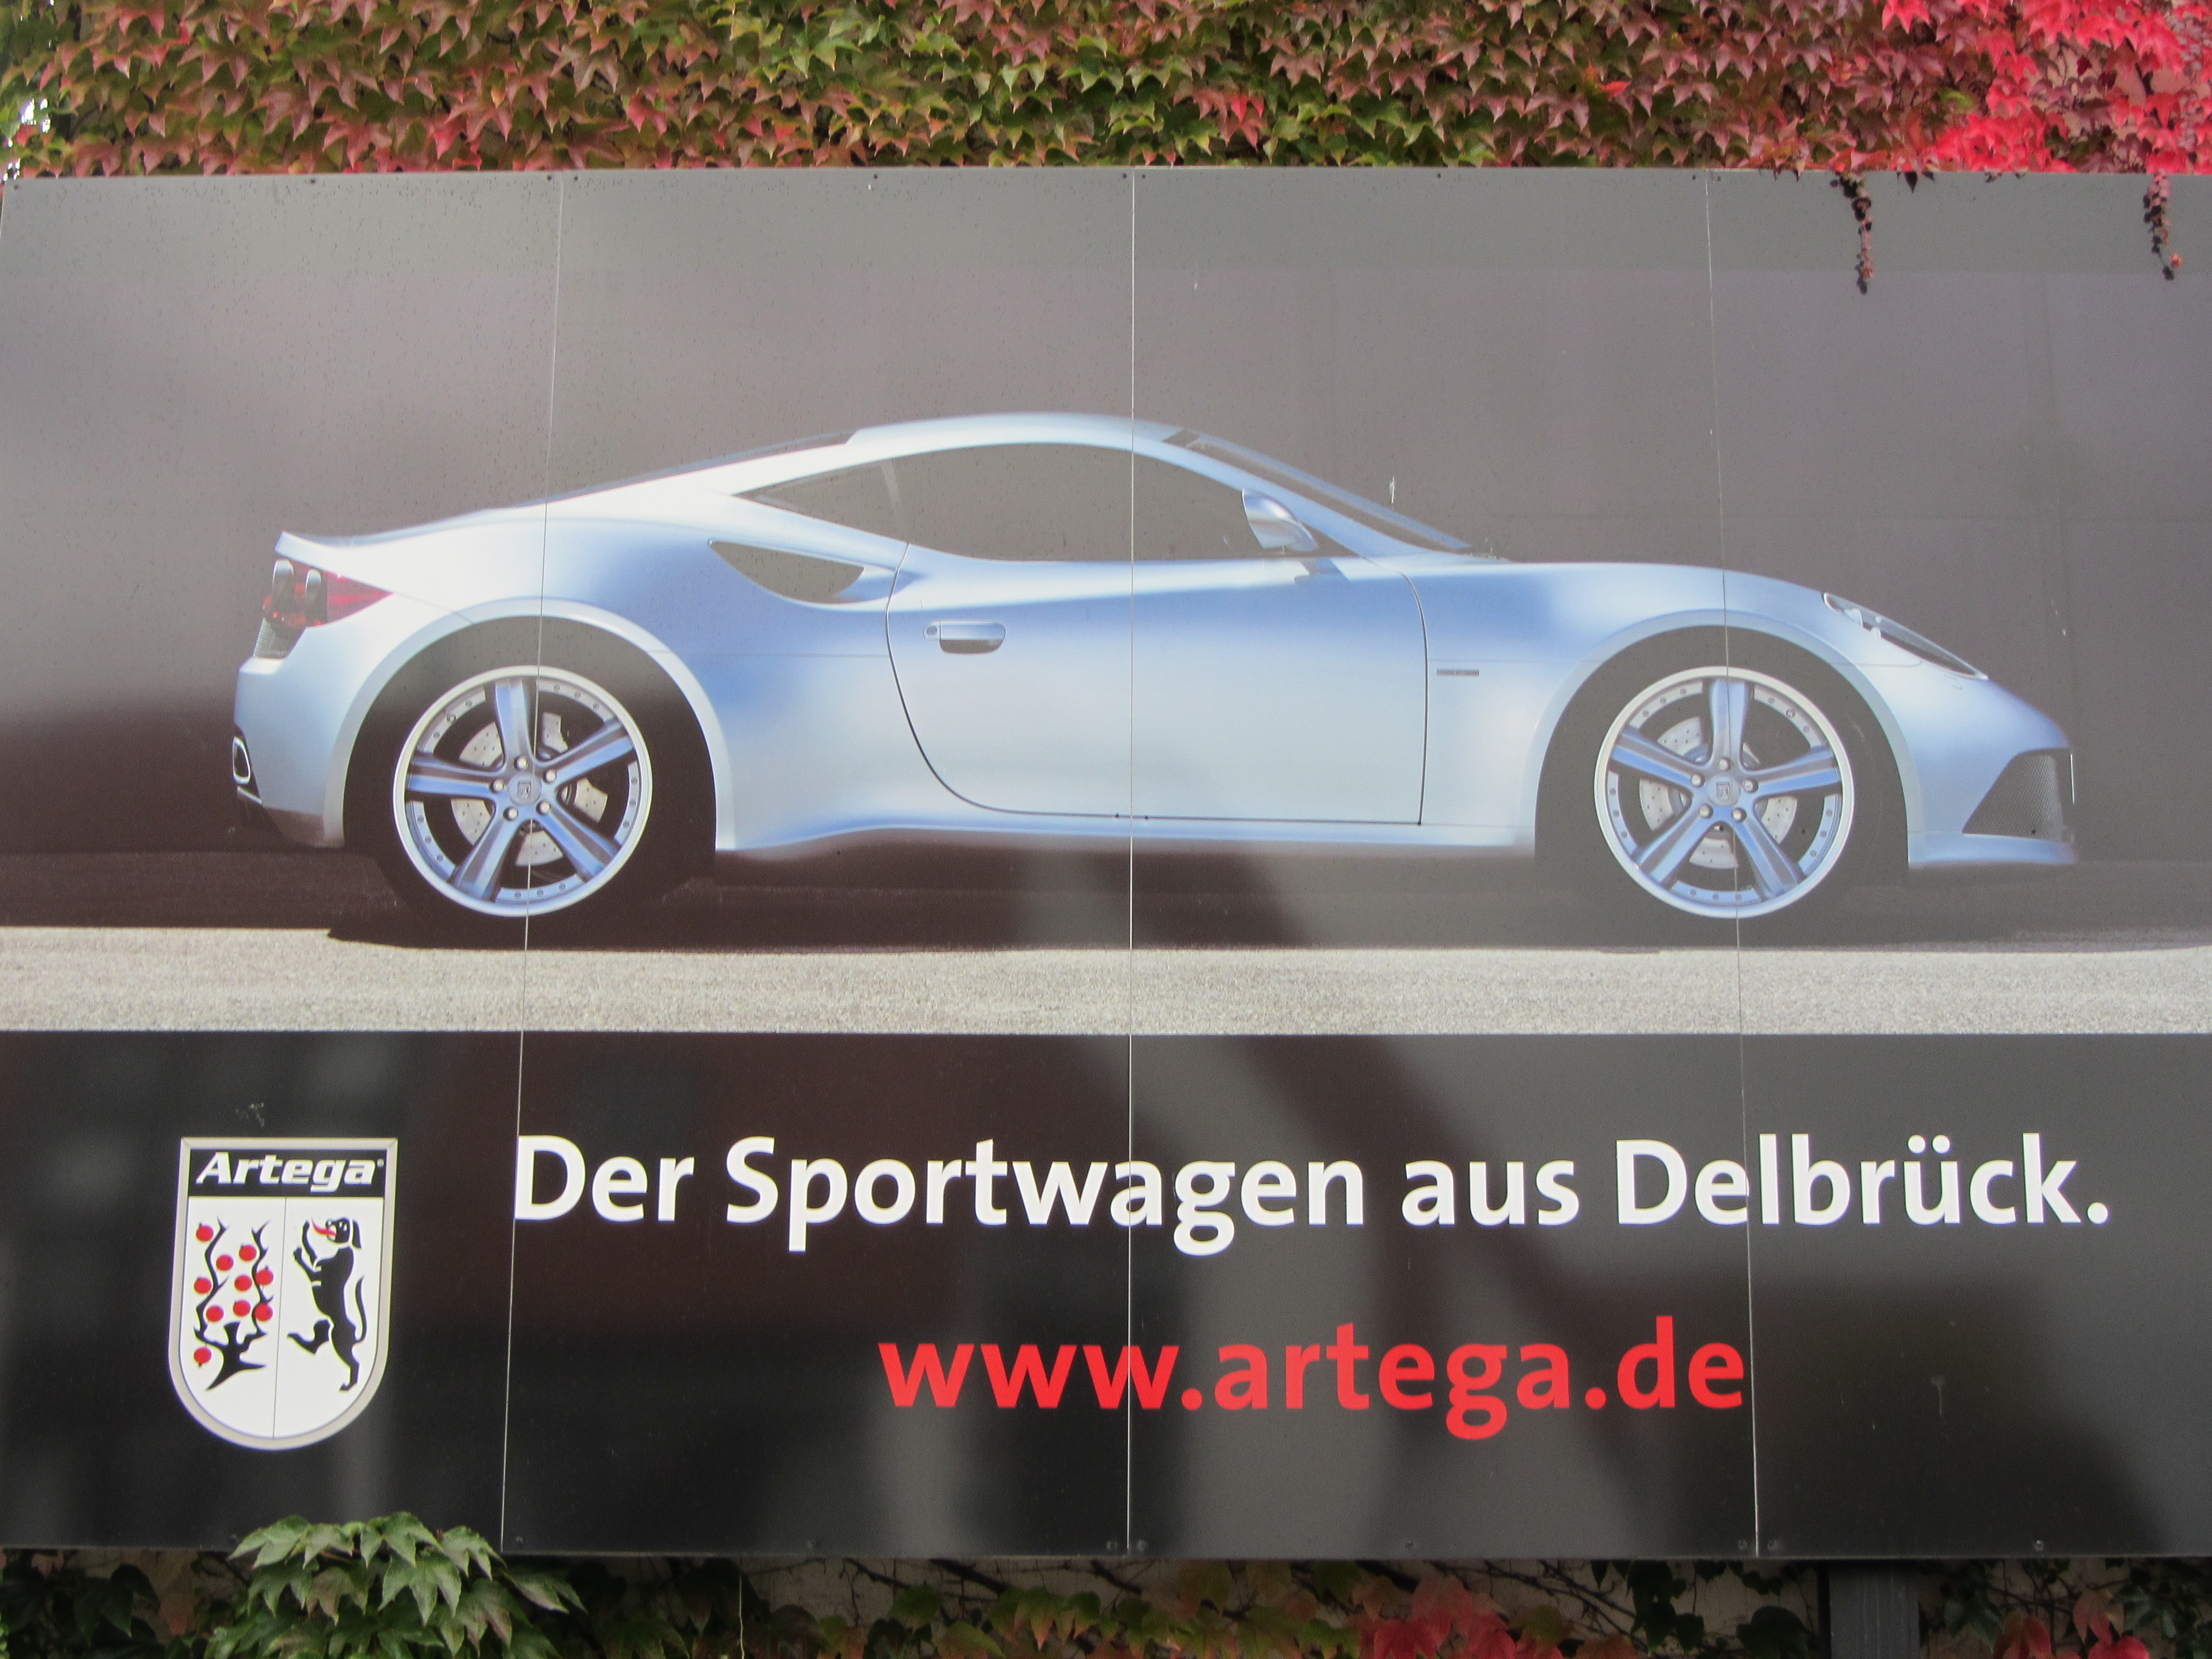 Delbrück Artega